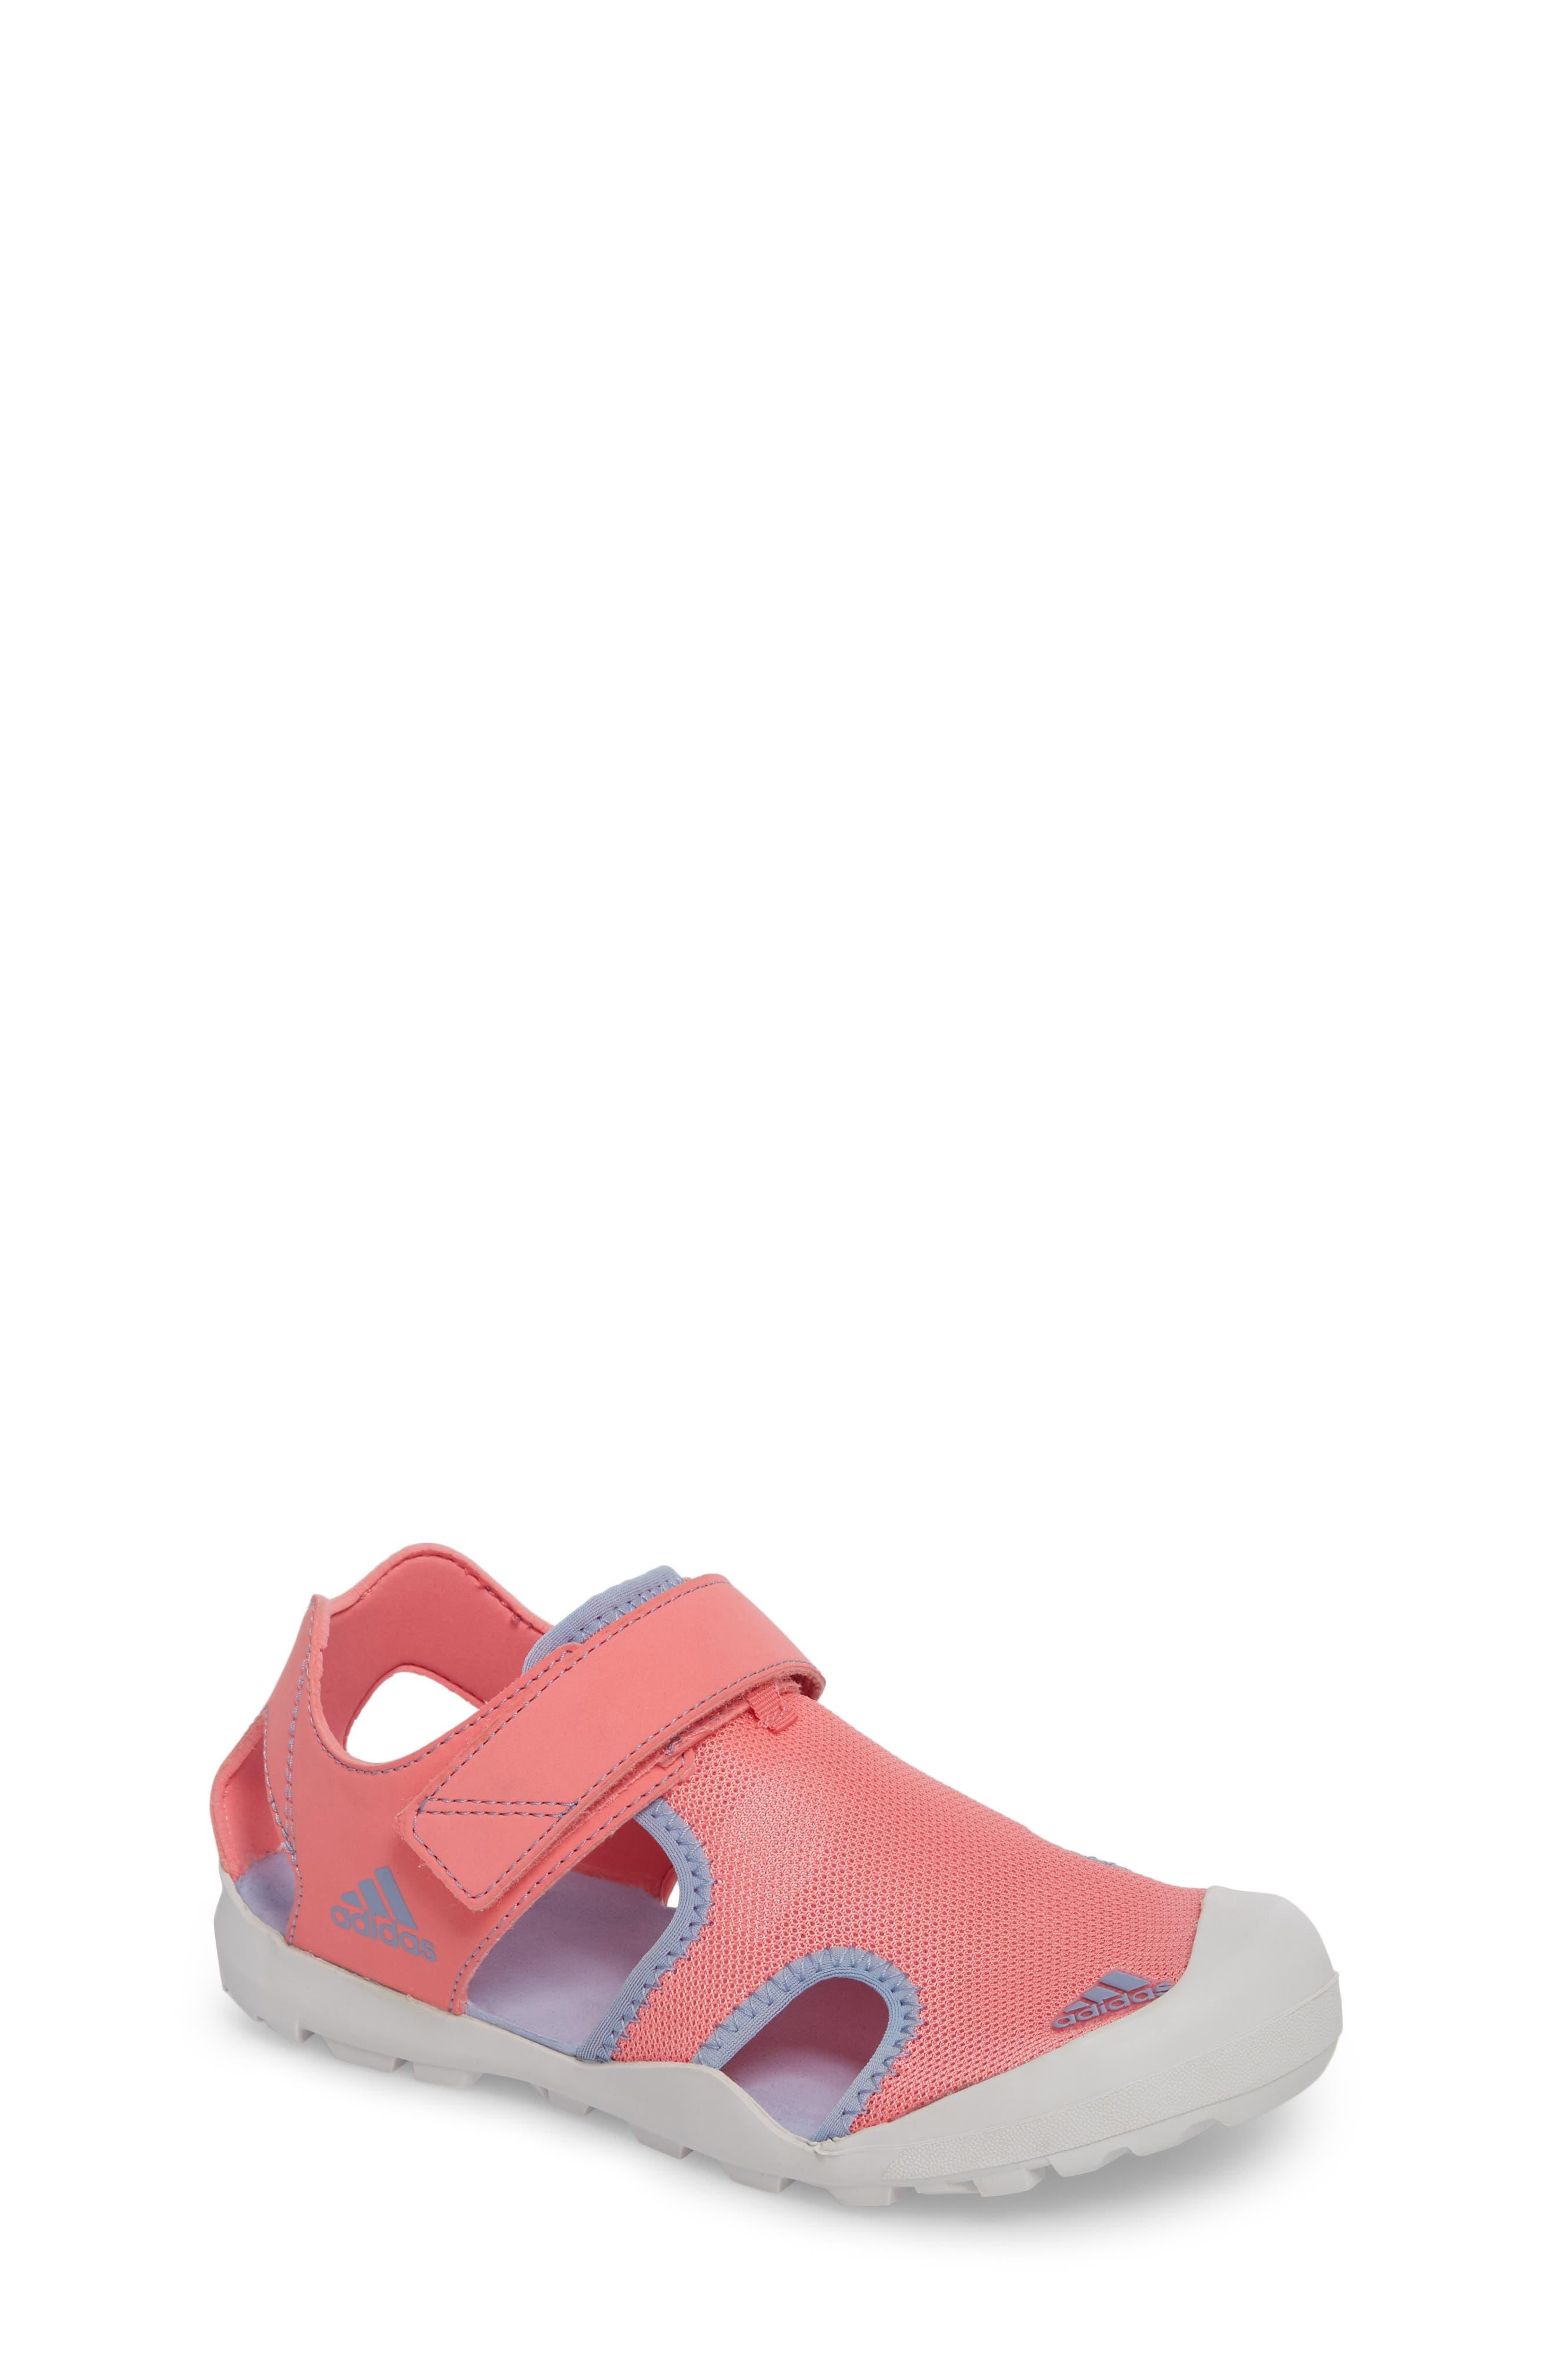 'Captain Toey' Sandal,                             Main thumbnail 1, color,                             Chalk Pink/ Chalk Blue/ Grey